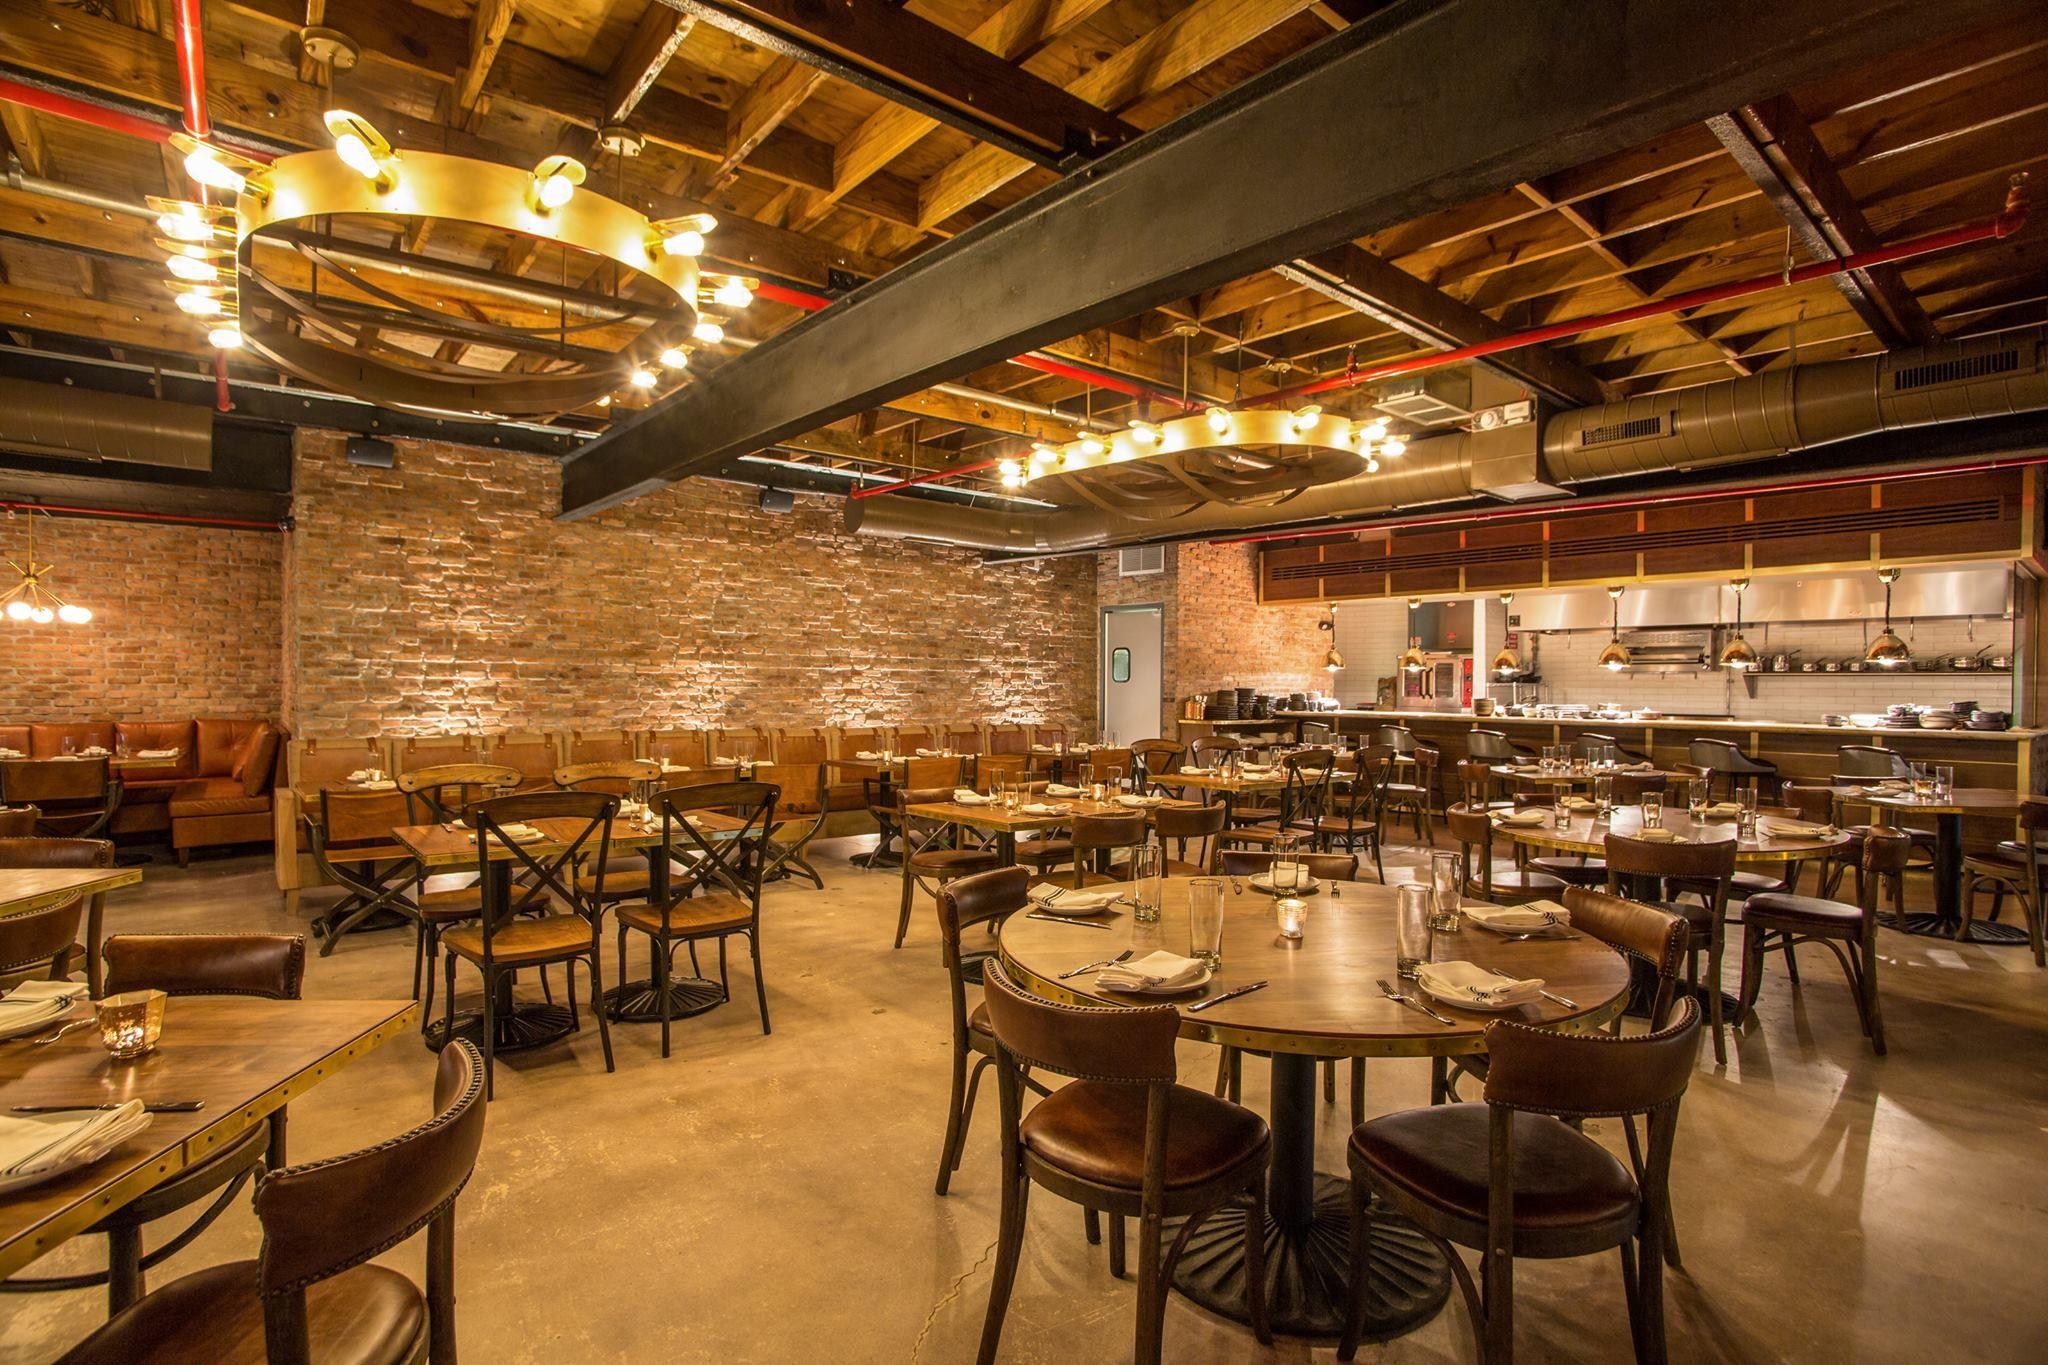 Beaker gray 10 photos 0 reviews restaurant edit